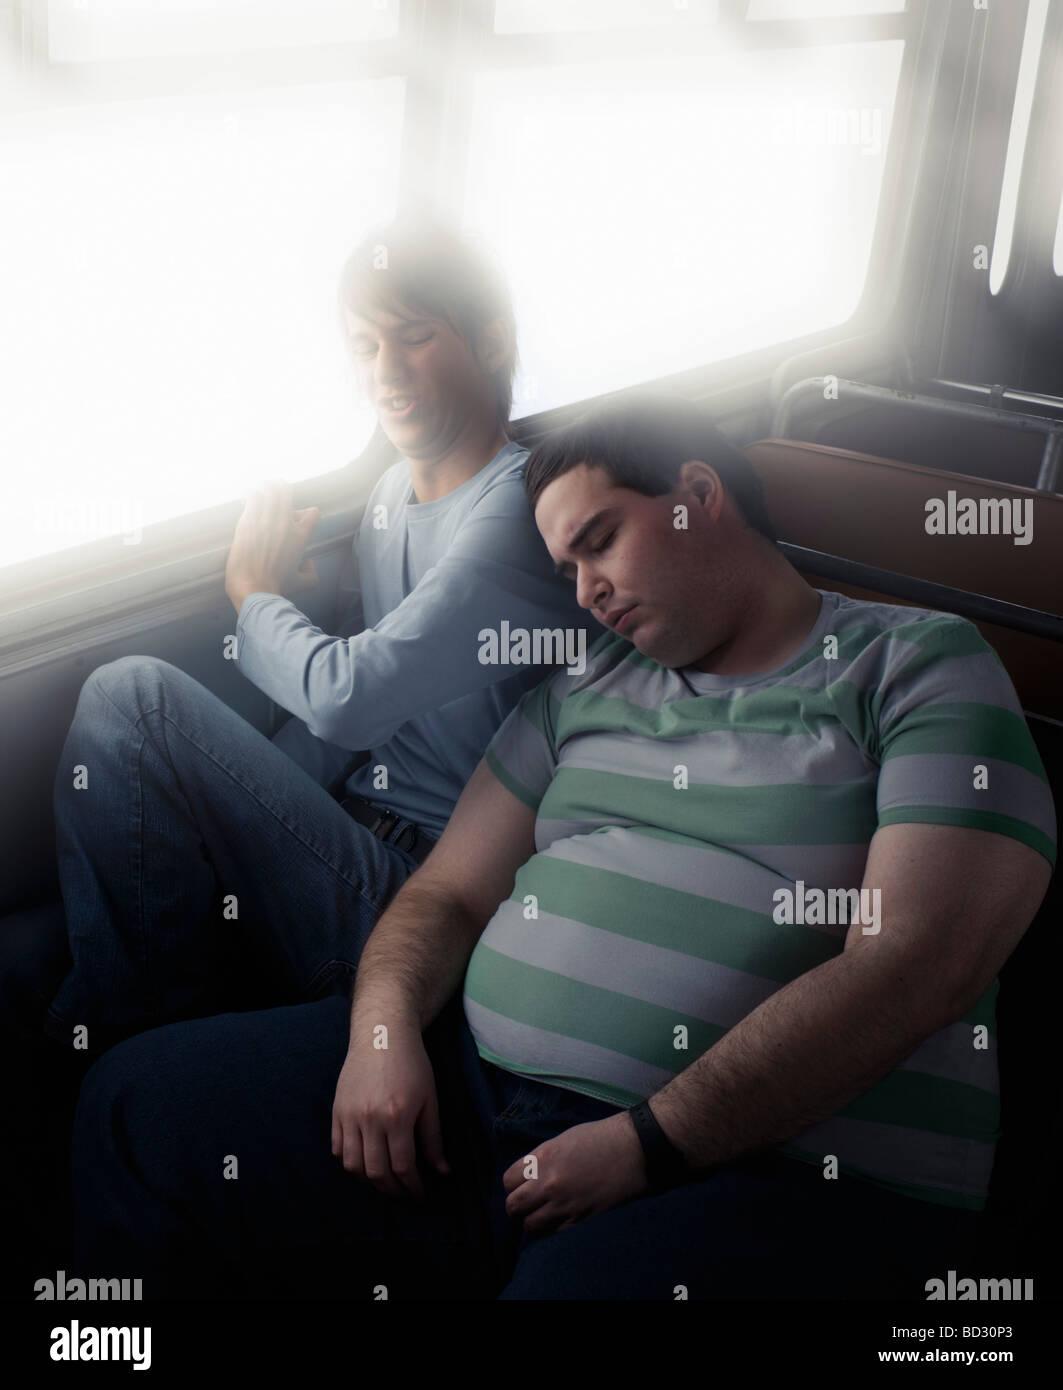 Thin boy squashed by fat boy - Stock Image